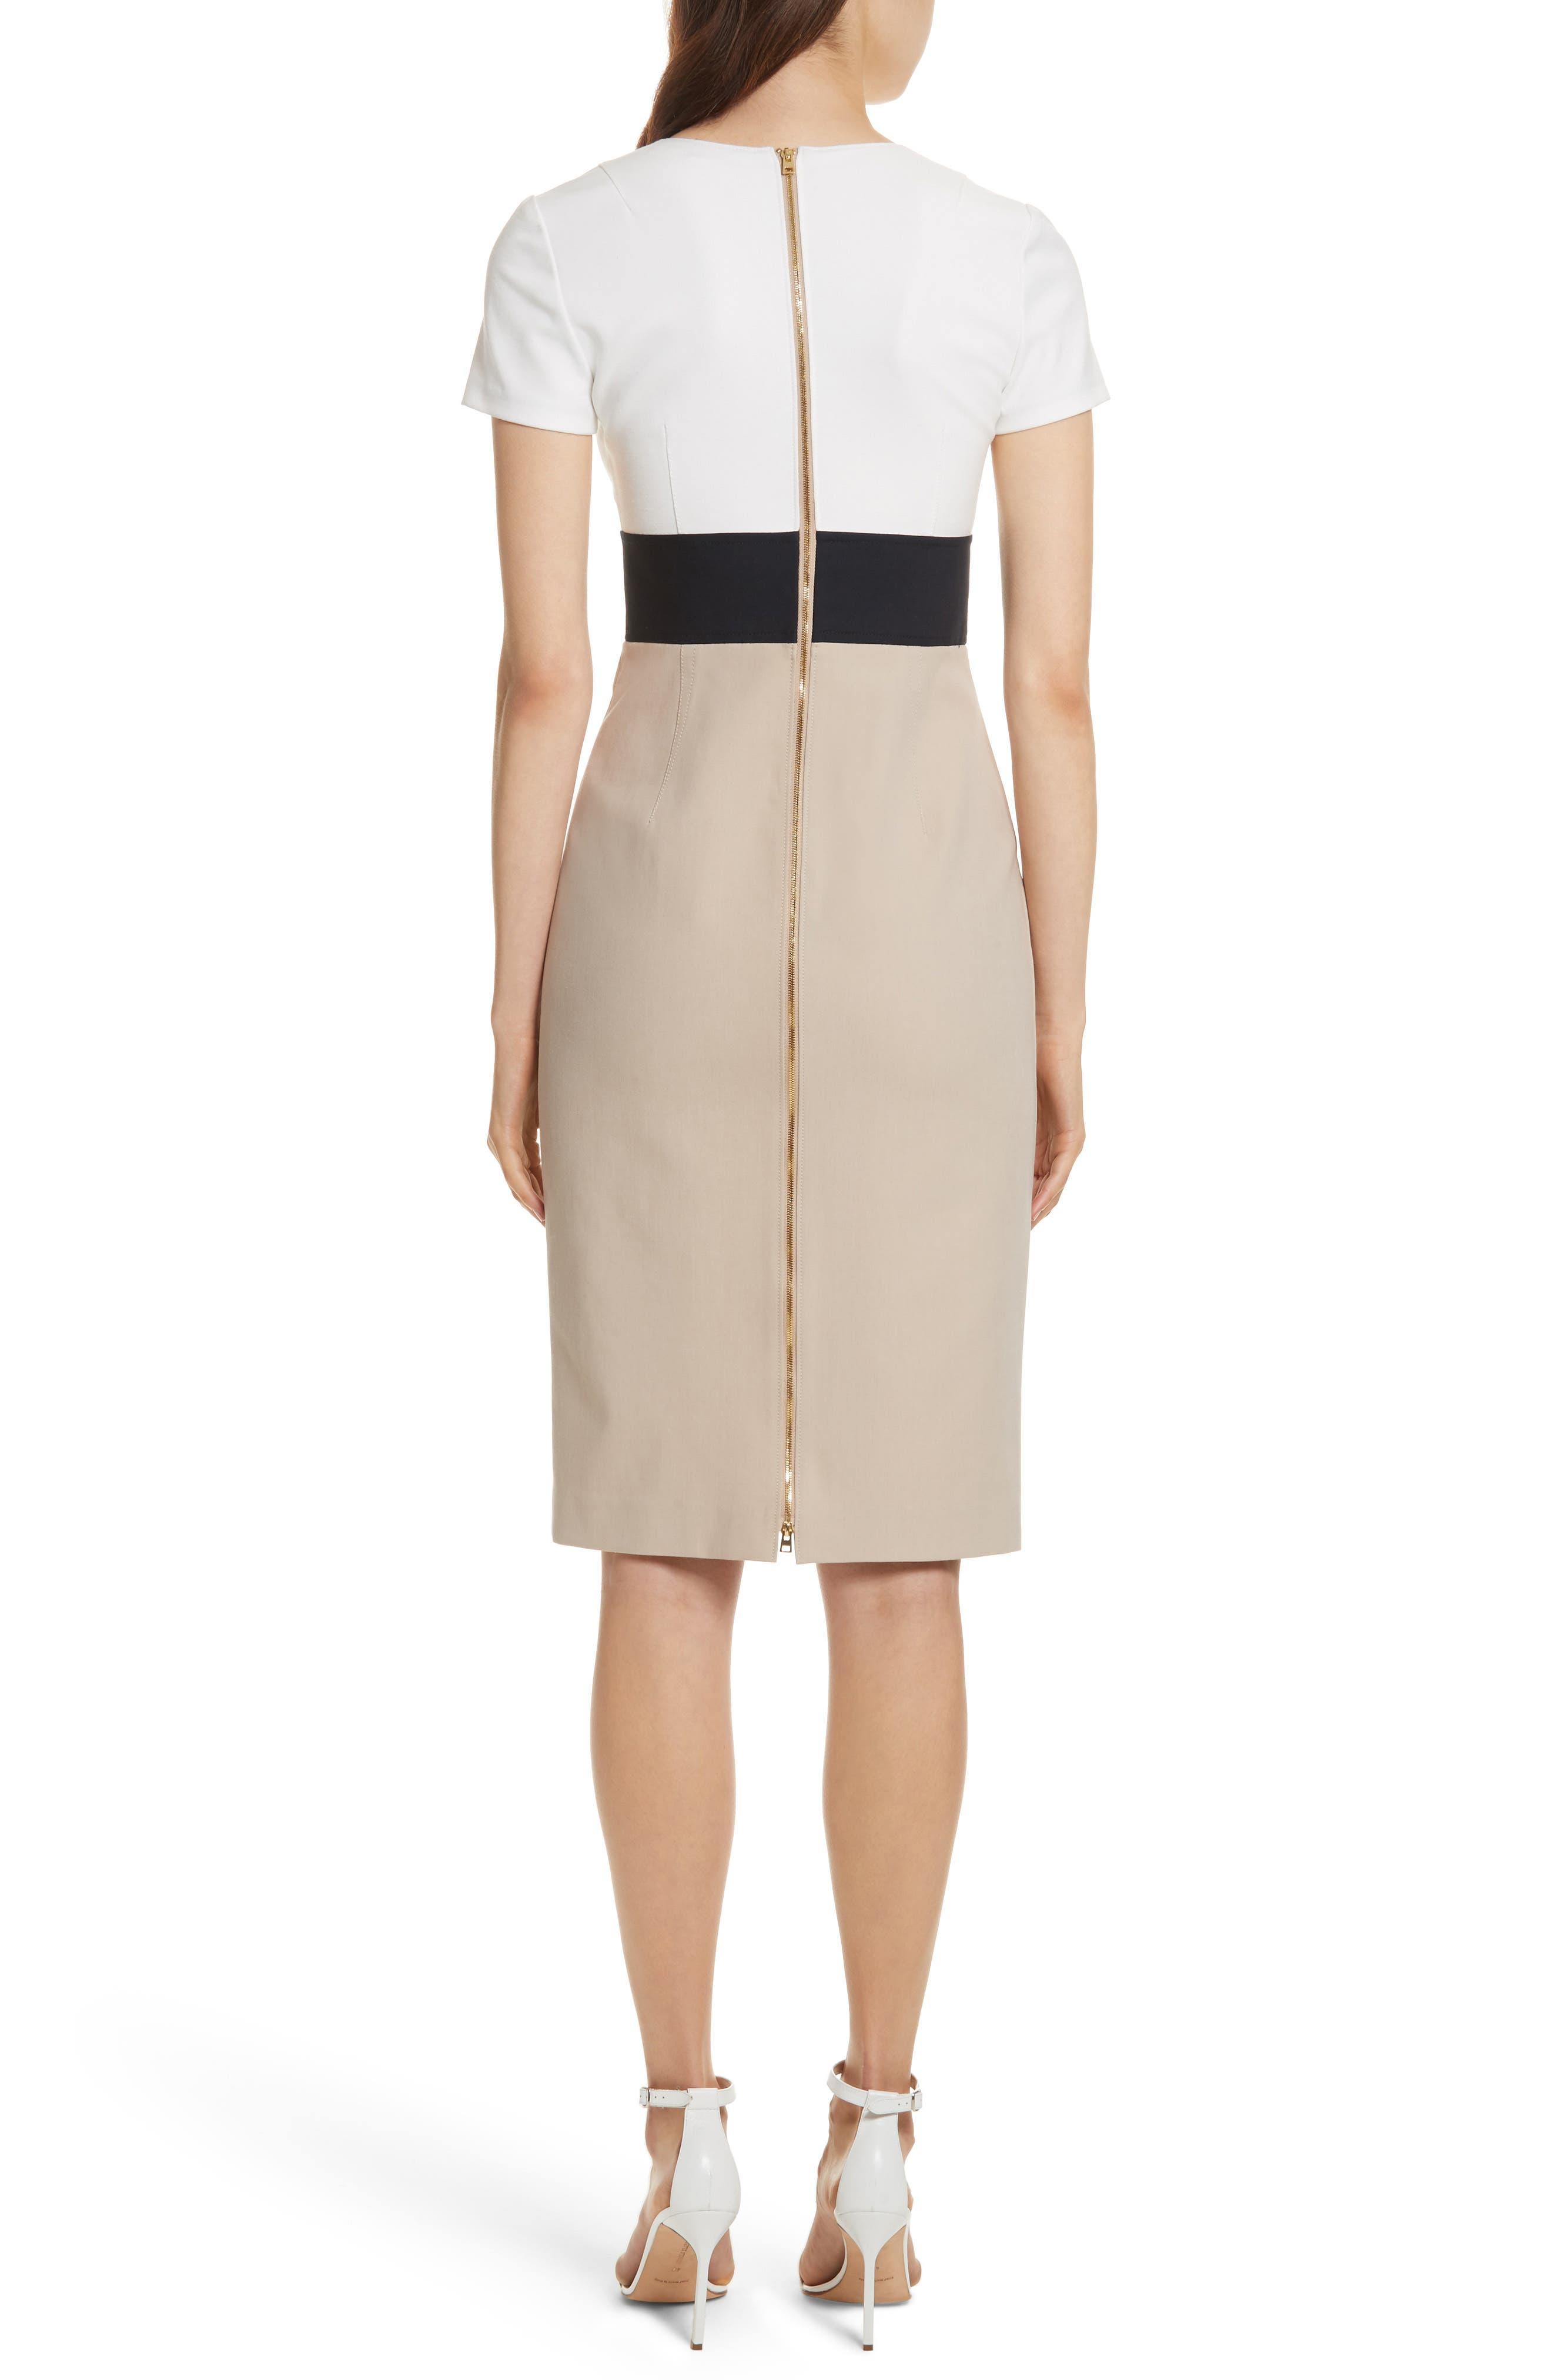 Diane von Furstenberg Colorblock Stretch Cotton Blend Sheath Dress,                             Alternate thumbnail 2, color,                             Sand/ Alexander Navy/ White